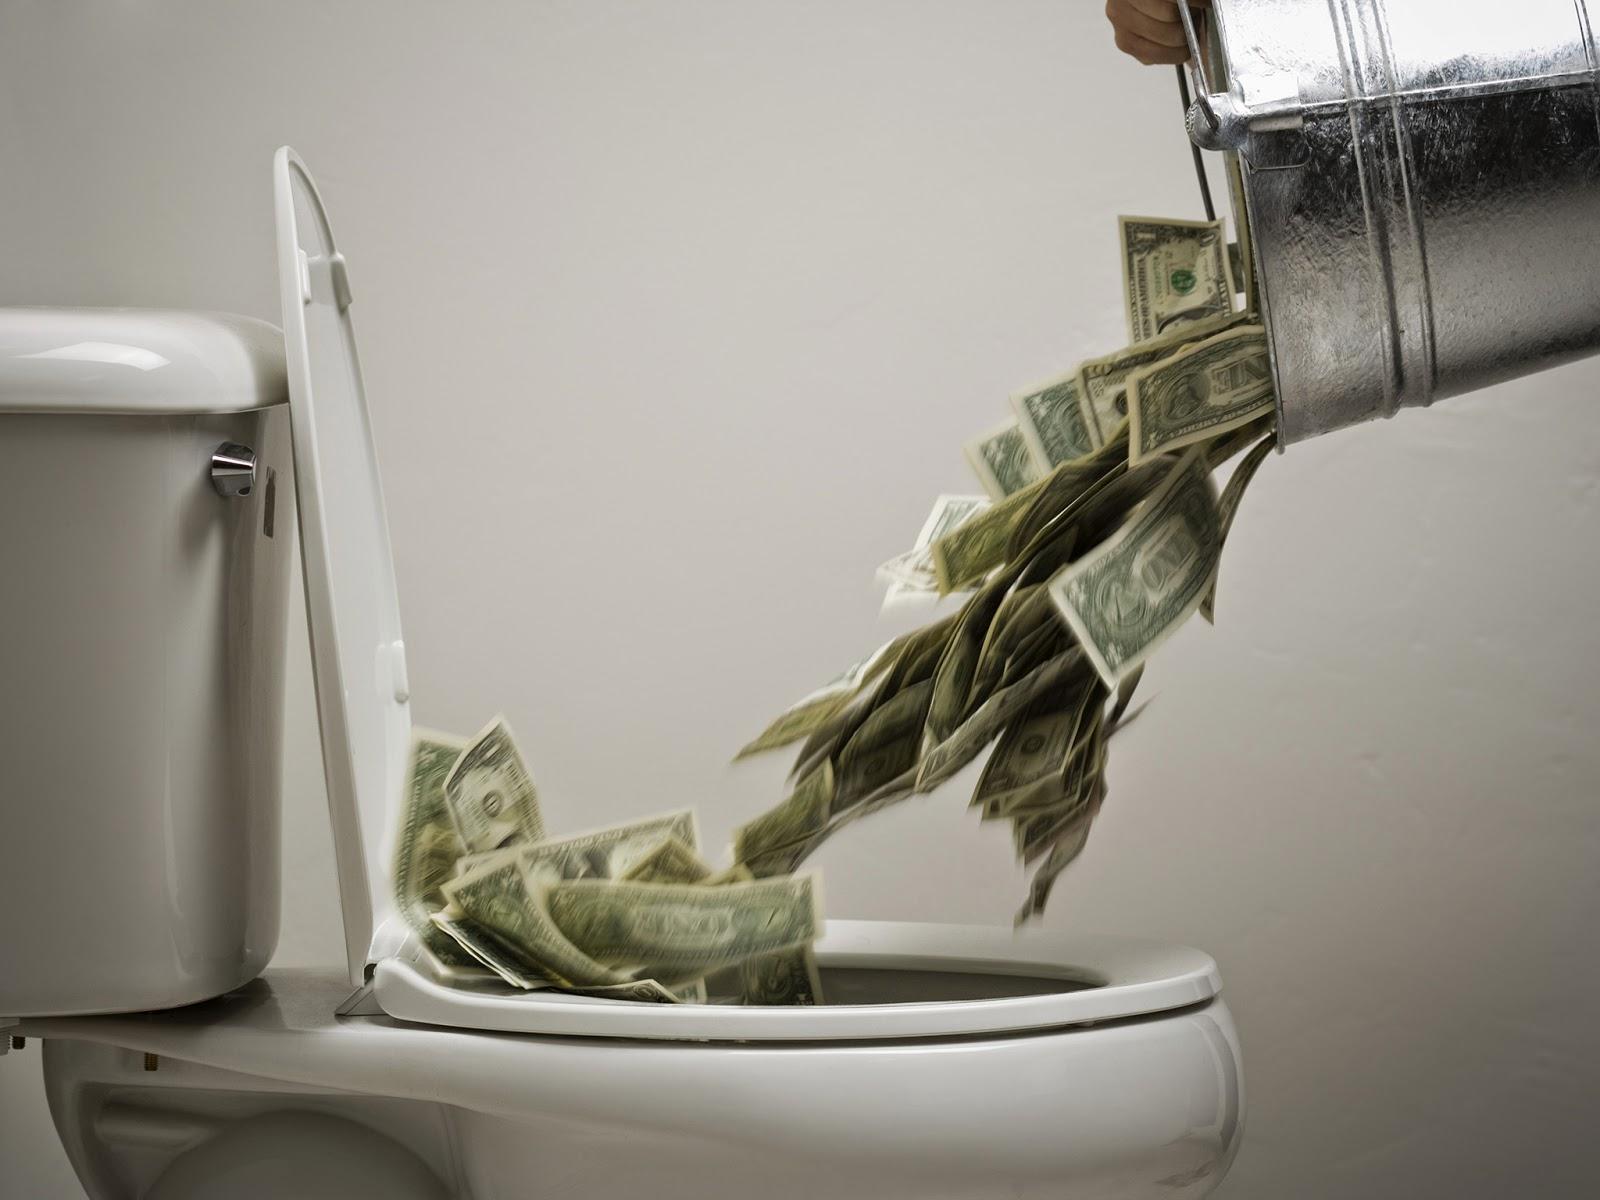 soldi buttati